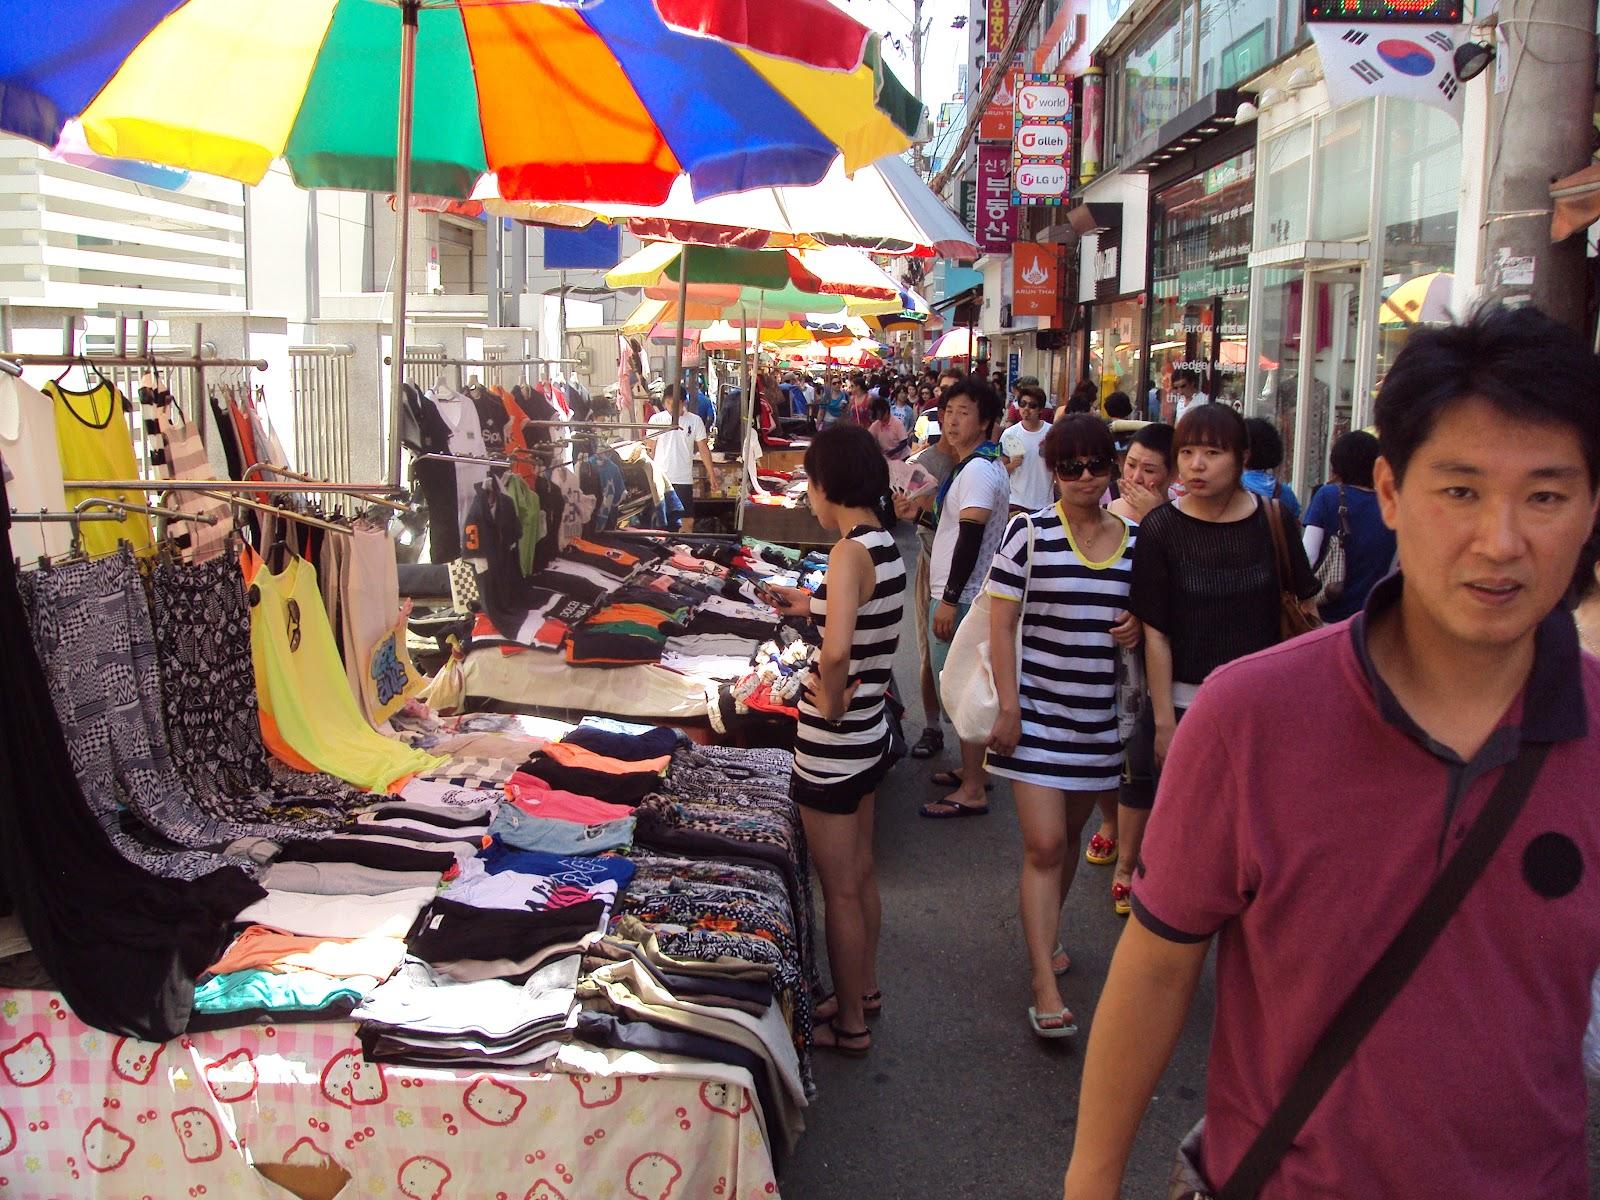 vacation south korea secrets ebook btuthy